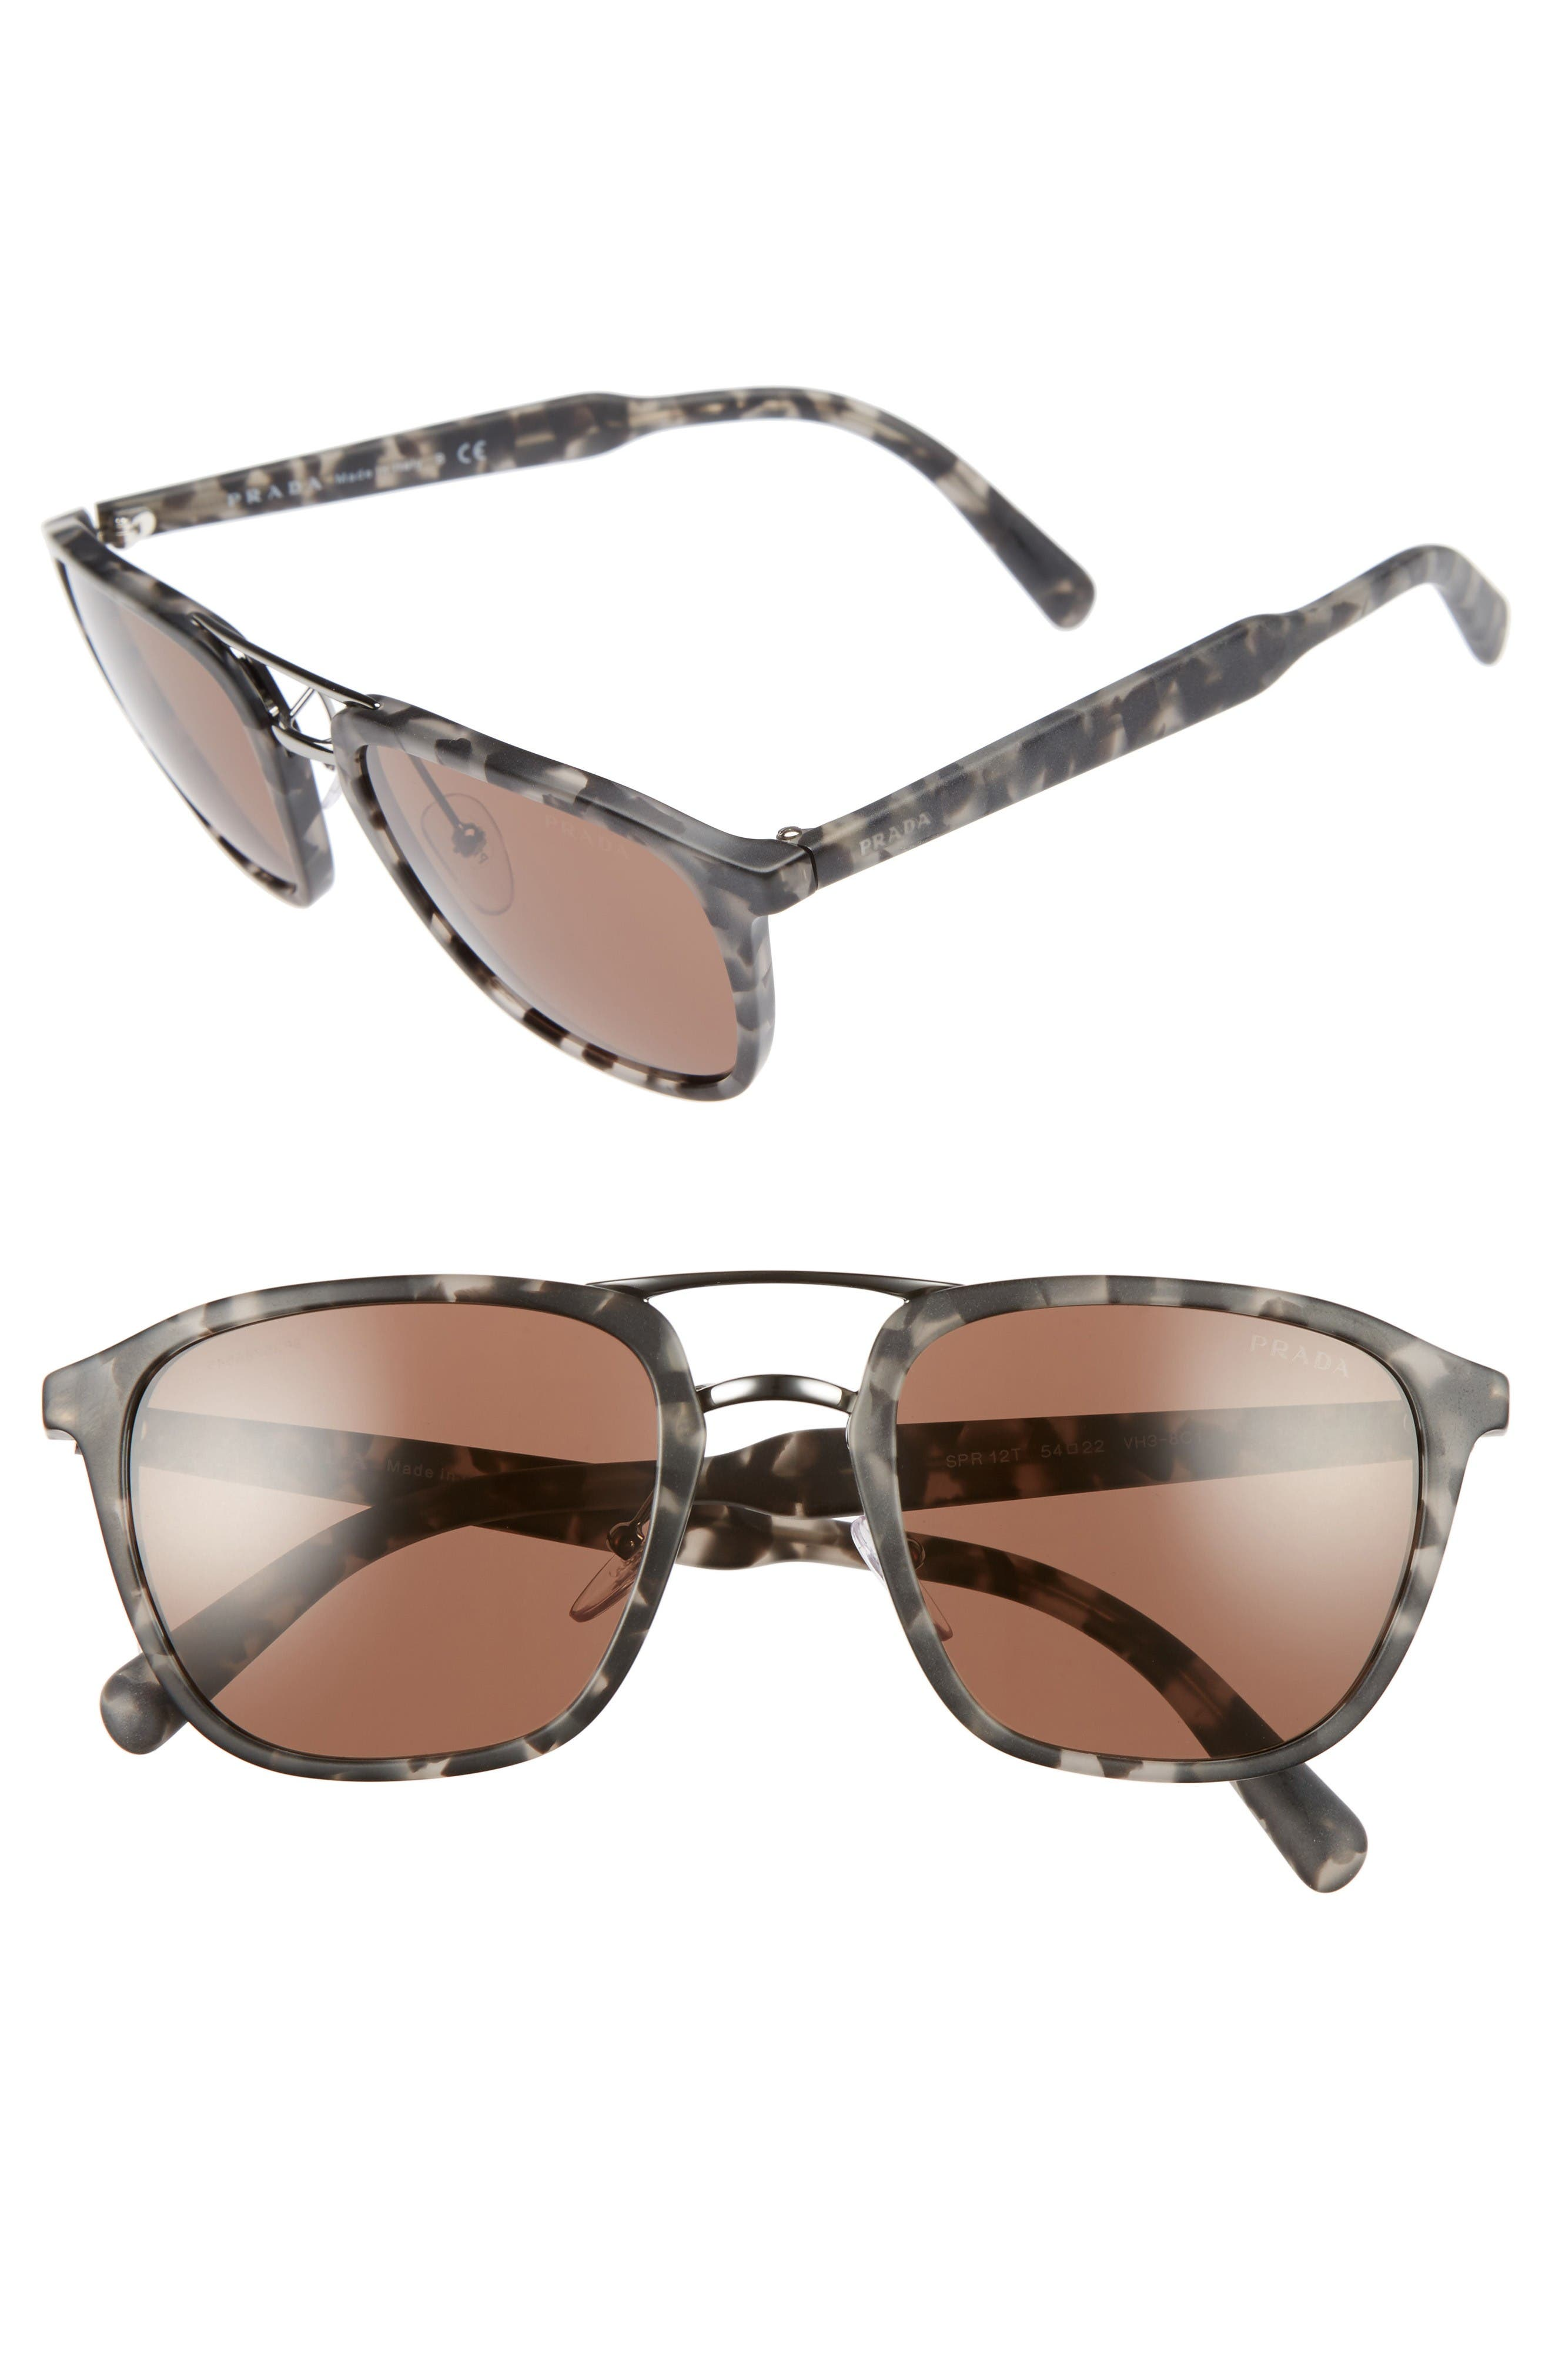 Prada 54mm Sunglasses